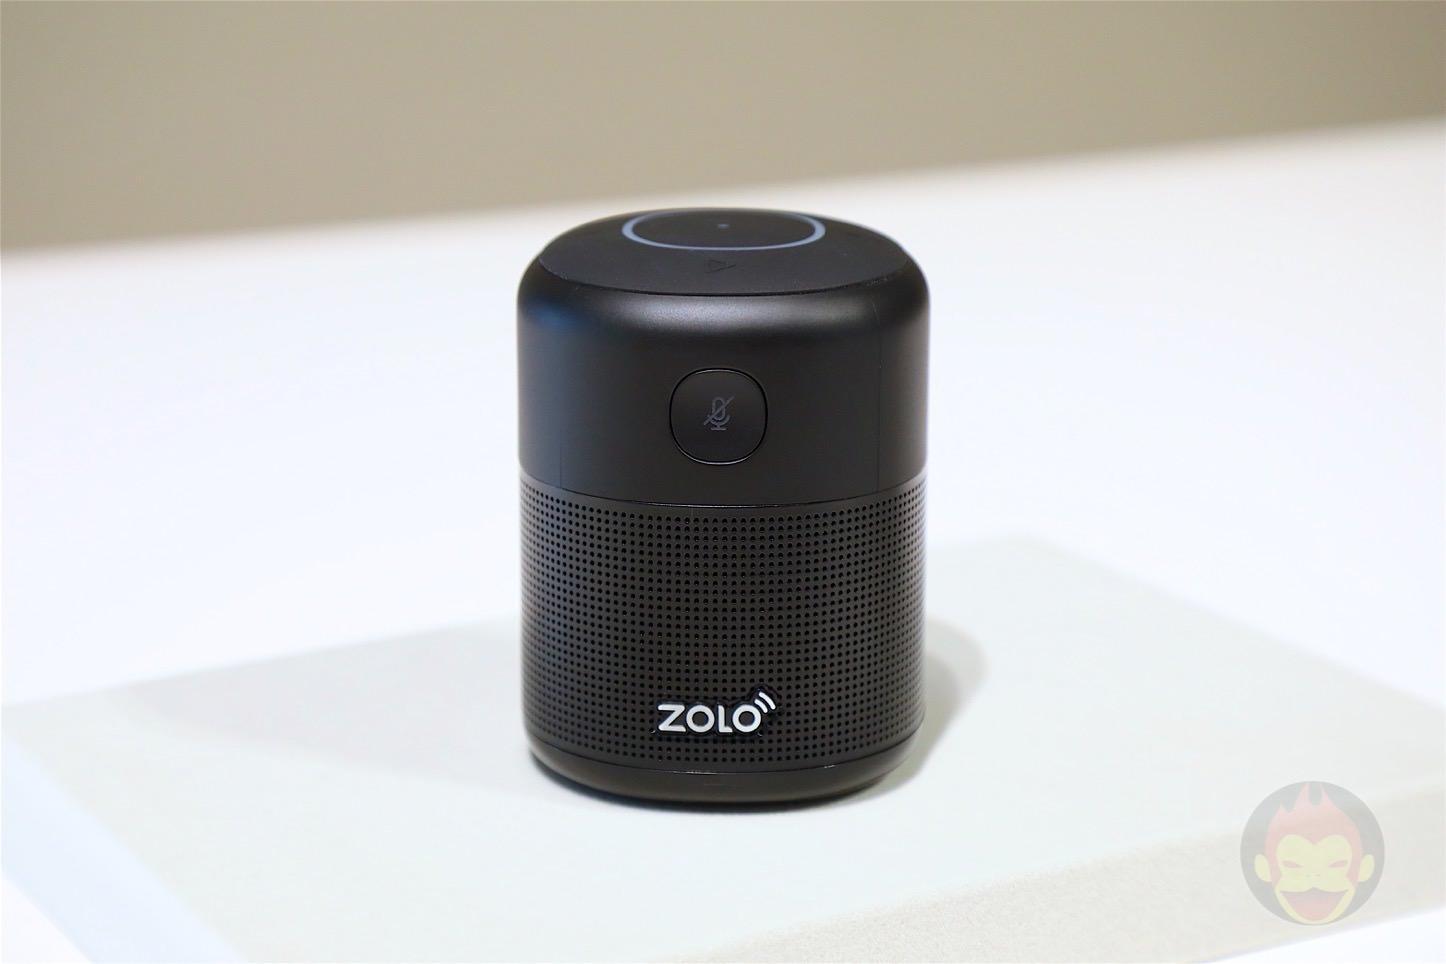 Anker-Zolo-Alexa-Speakers-01.jpg